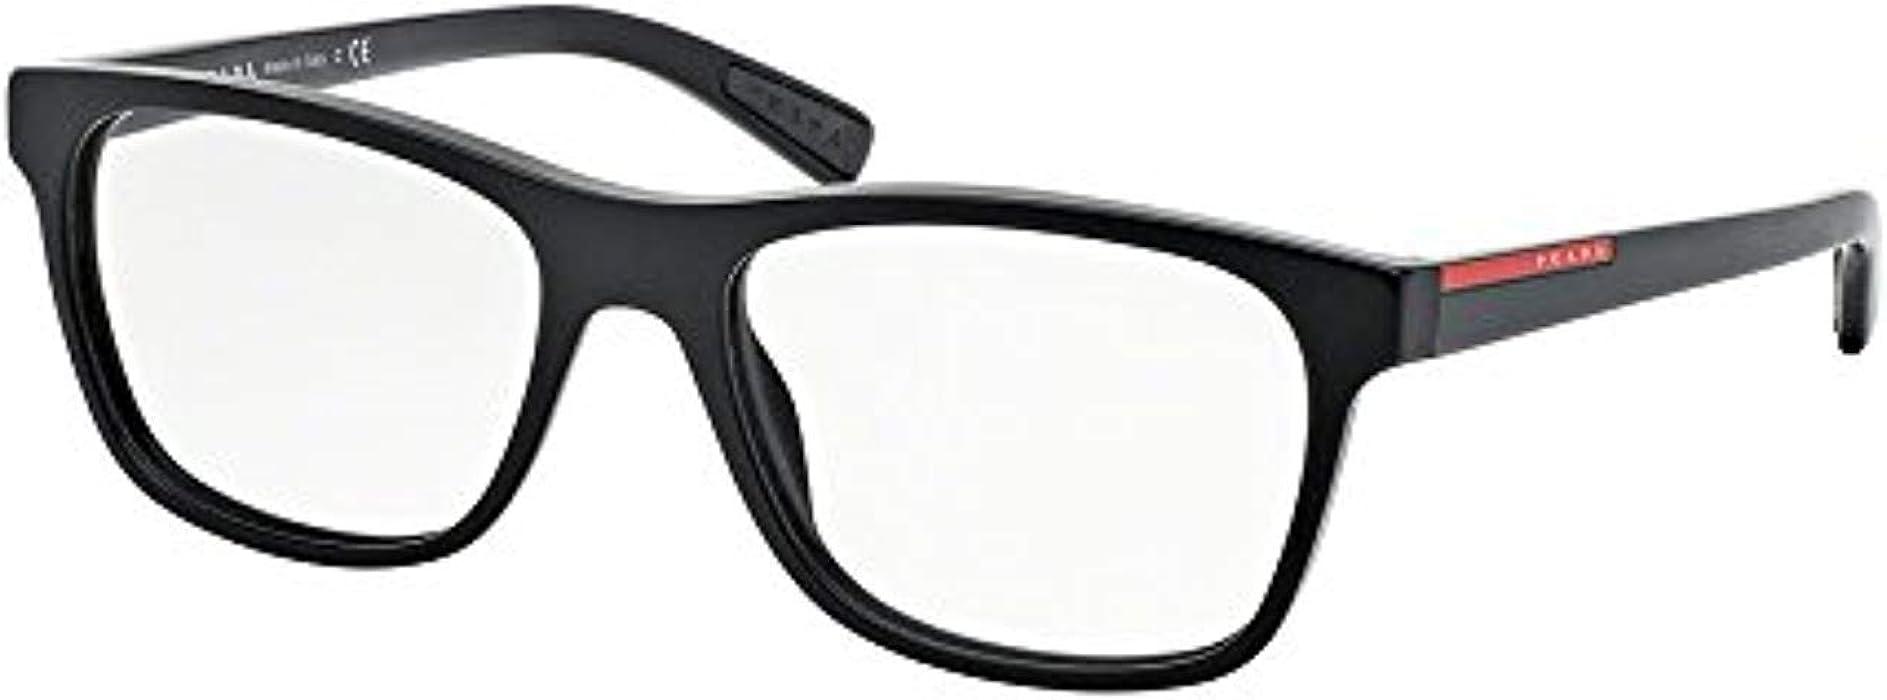 b218e94bcf Prada Linea Rossa Men s PS 01FVA Eyeglasses 55mm at Amazon Men s ...